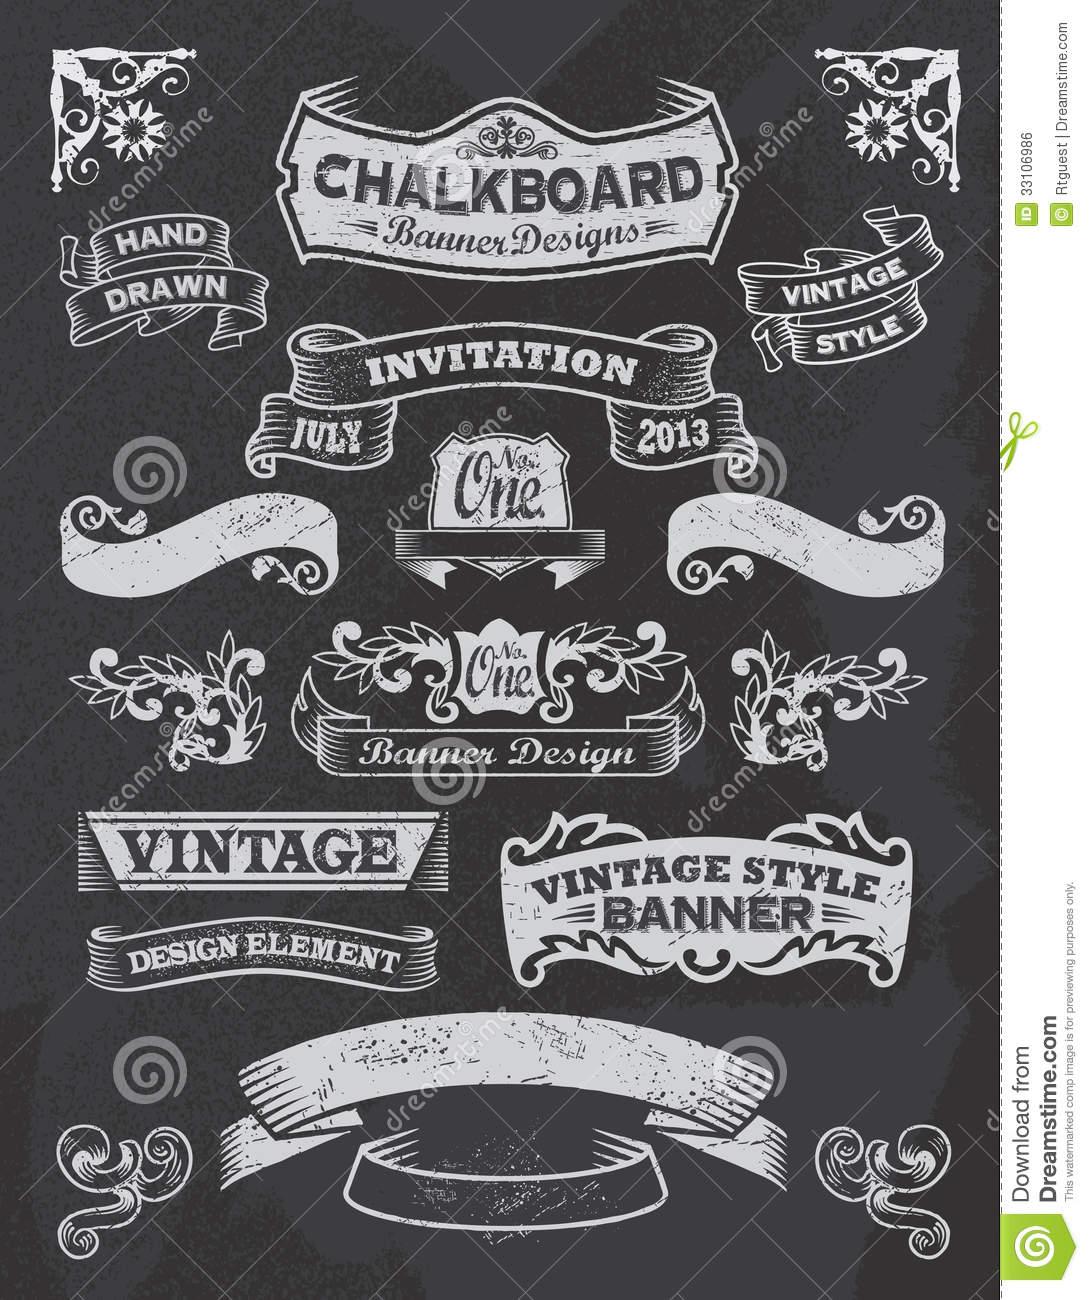 chalkboard banners free download.